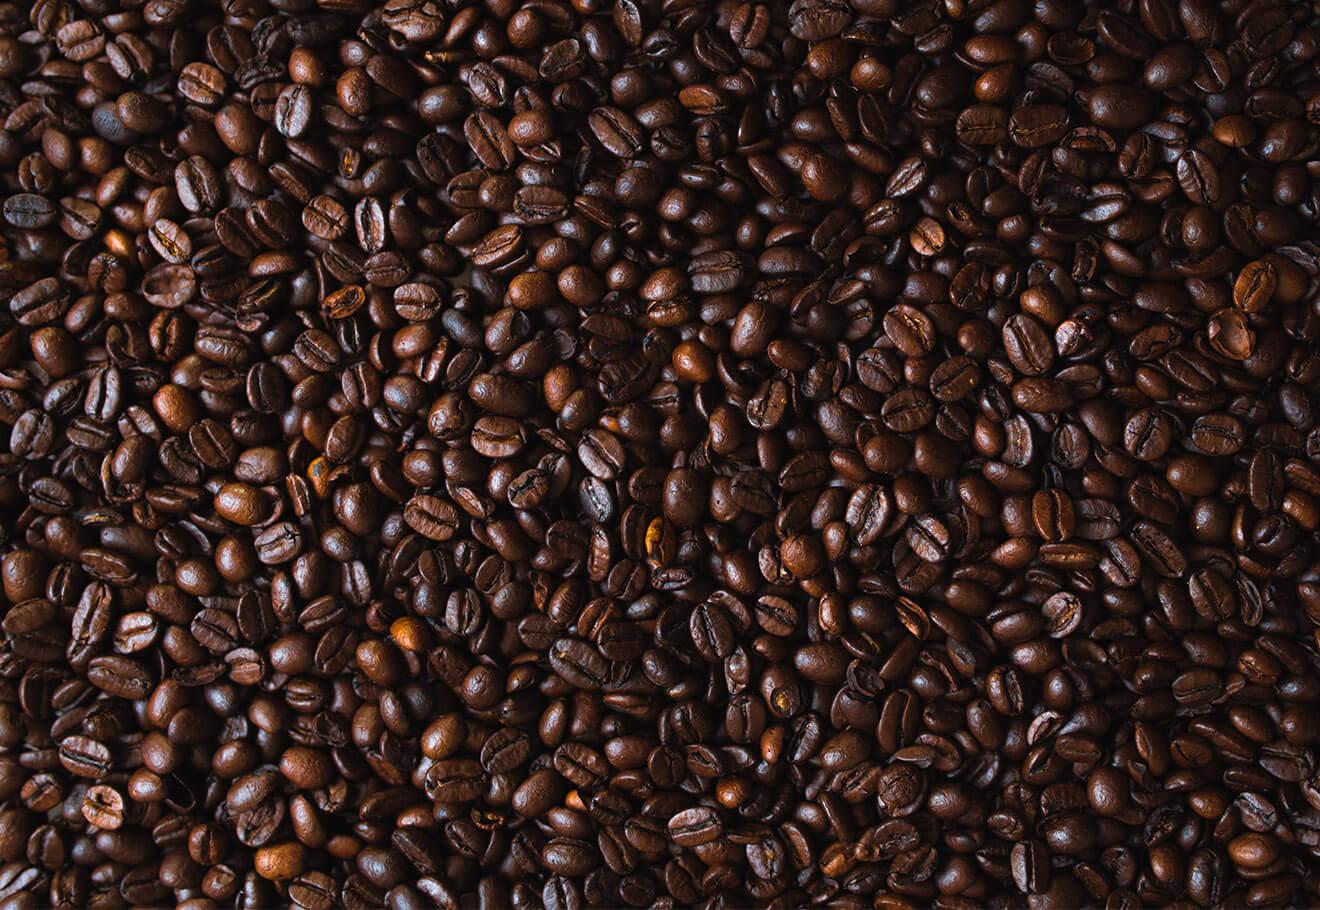 Use reusable coffee pods